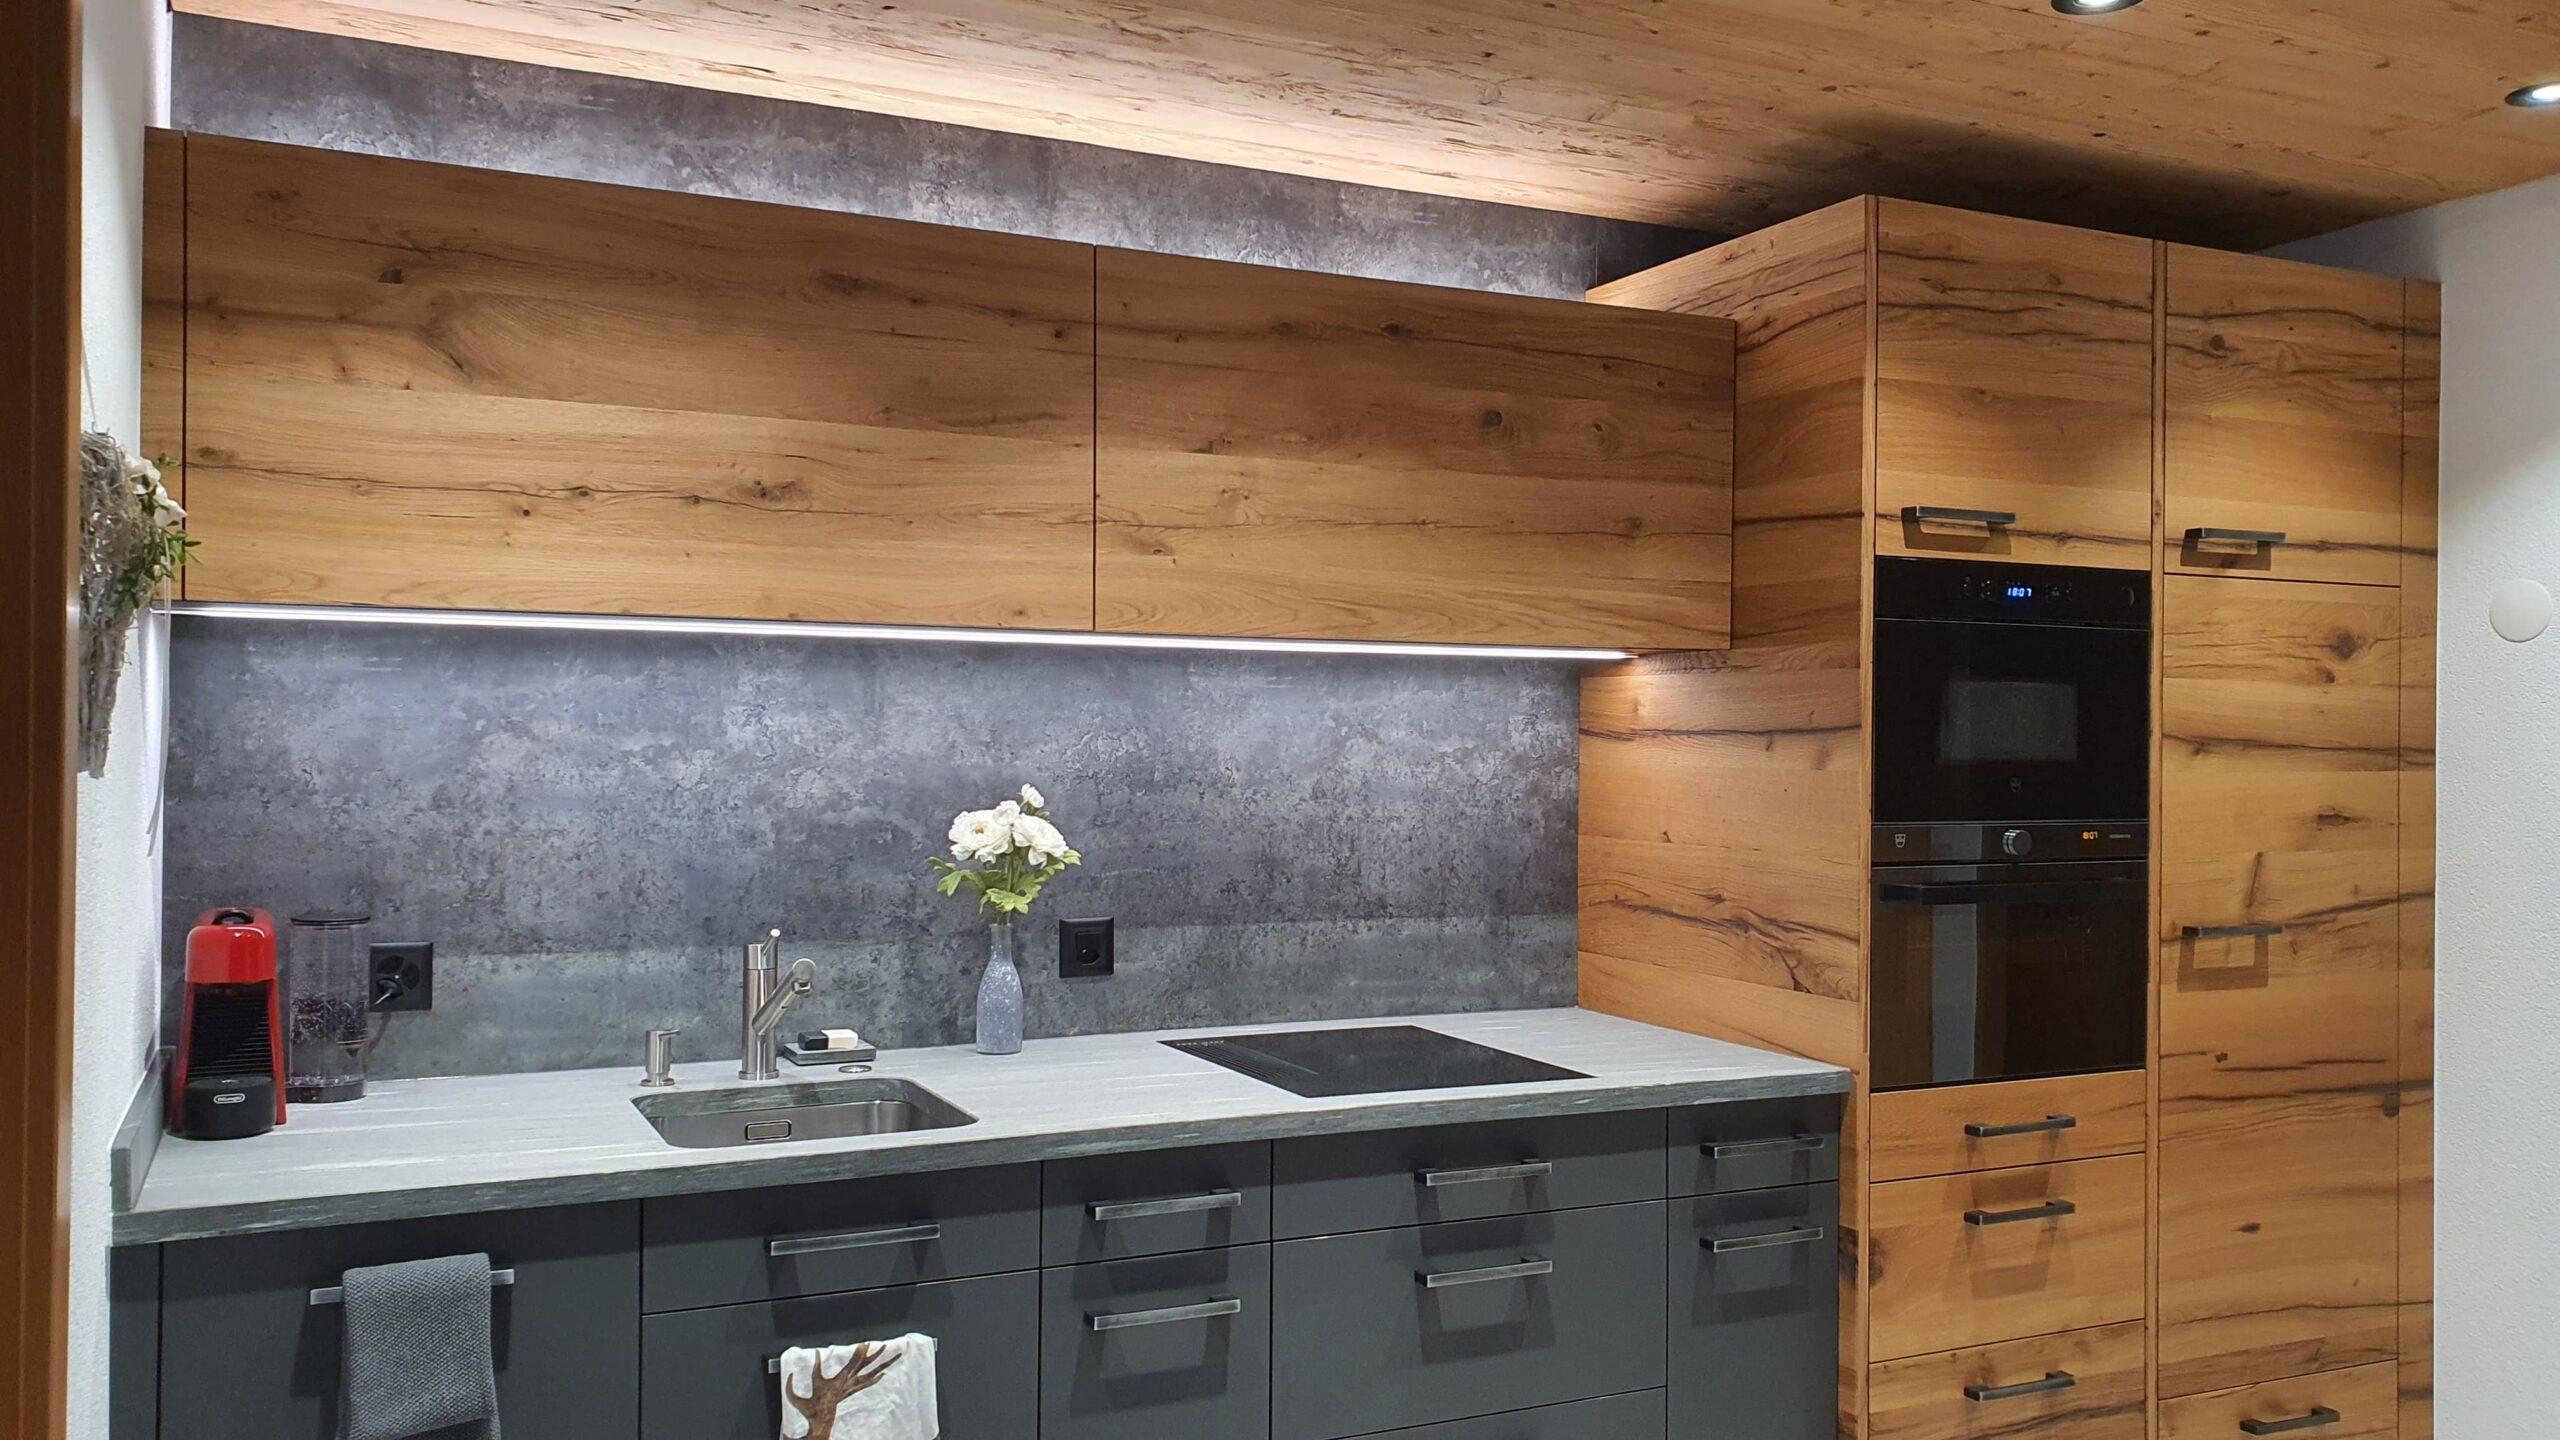 Wooddesign_Holzdesign_Küche aus Altholz_Eiche Altholz_modern_rustikal_LED-Beleuchtung_Ferienwohnung_anthrazit_Altholzdecke (2)